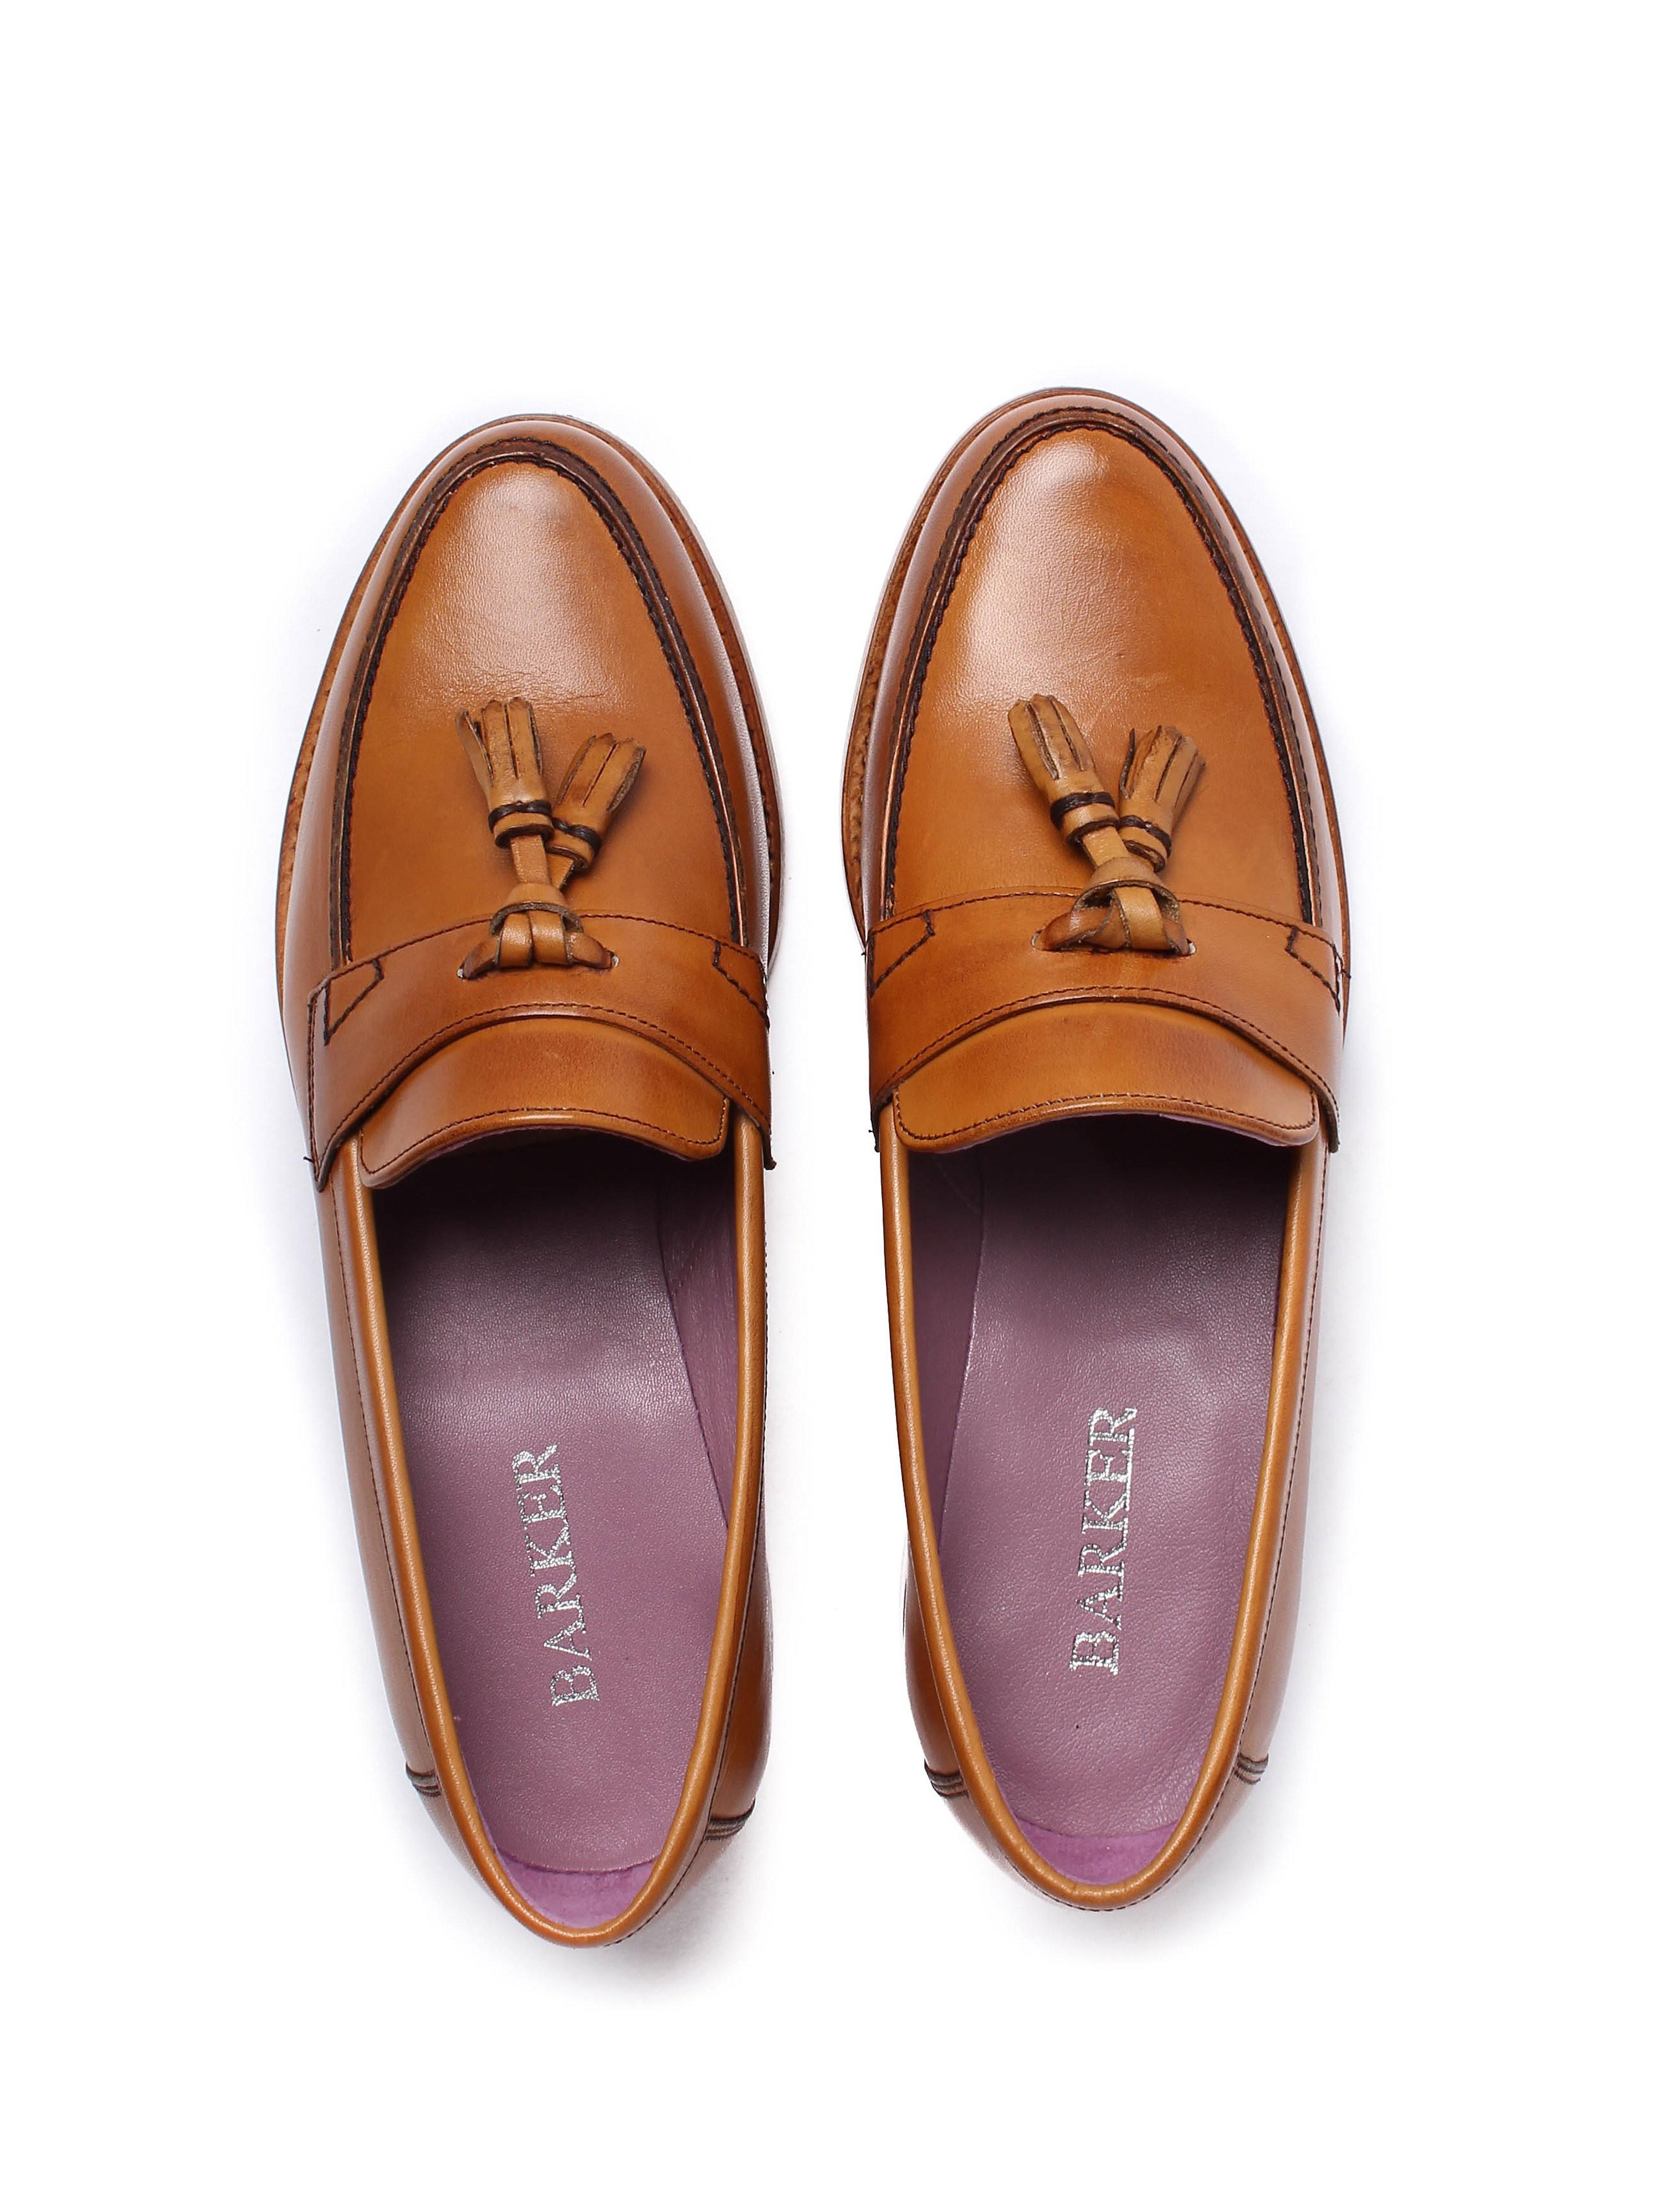 Barker Women's Imogen Classic Leather Loafers - Cedar Calf